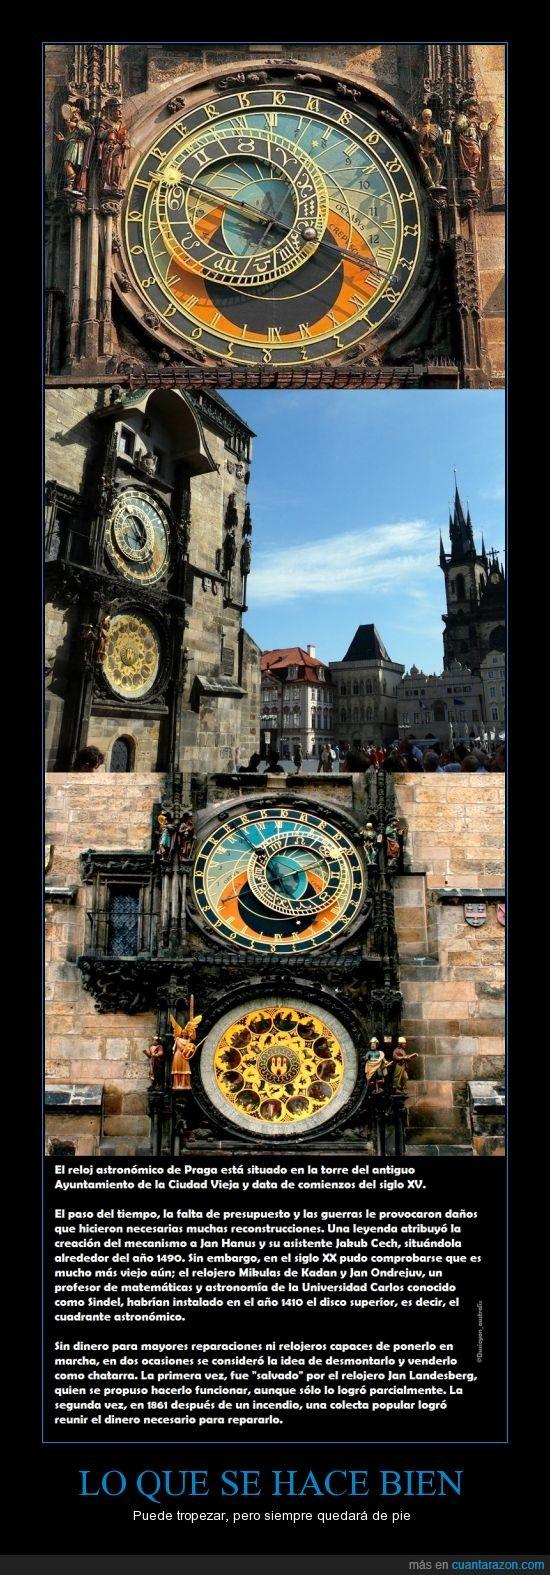 1410,Hacer,reloj astronomico de praga,segunda guerra mundial,siglos,tropezar